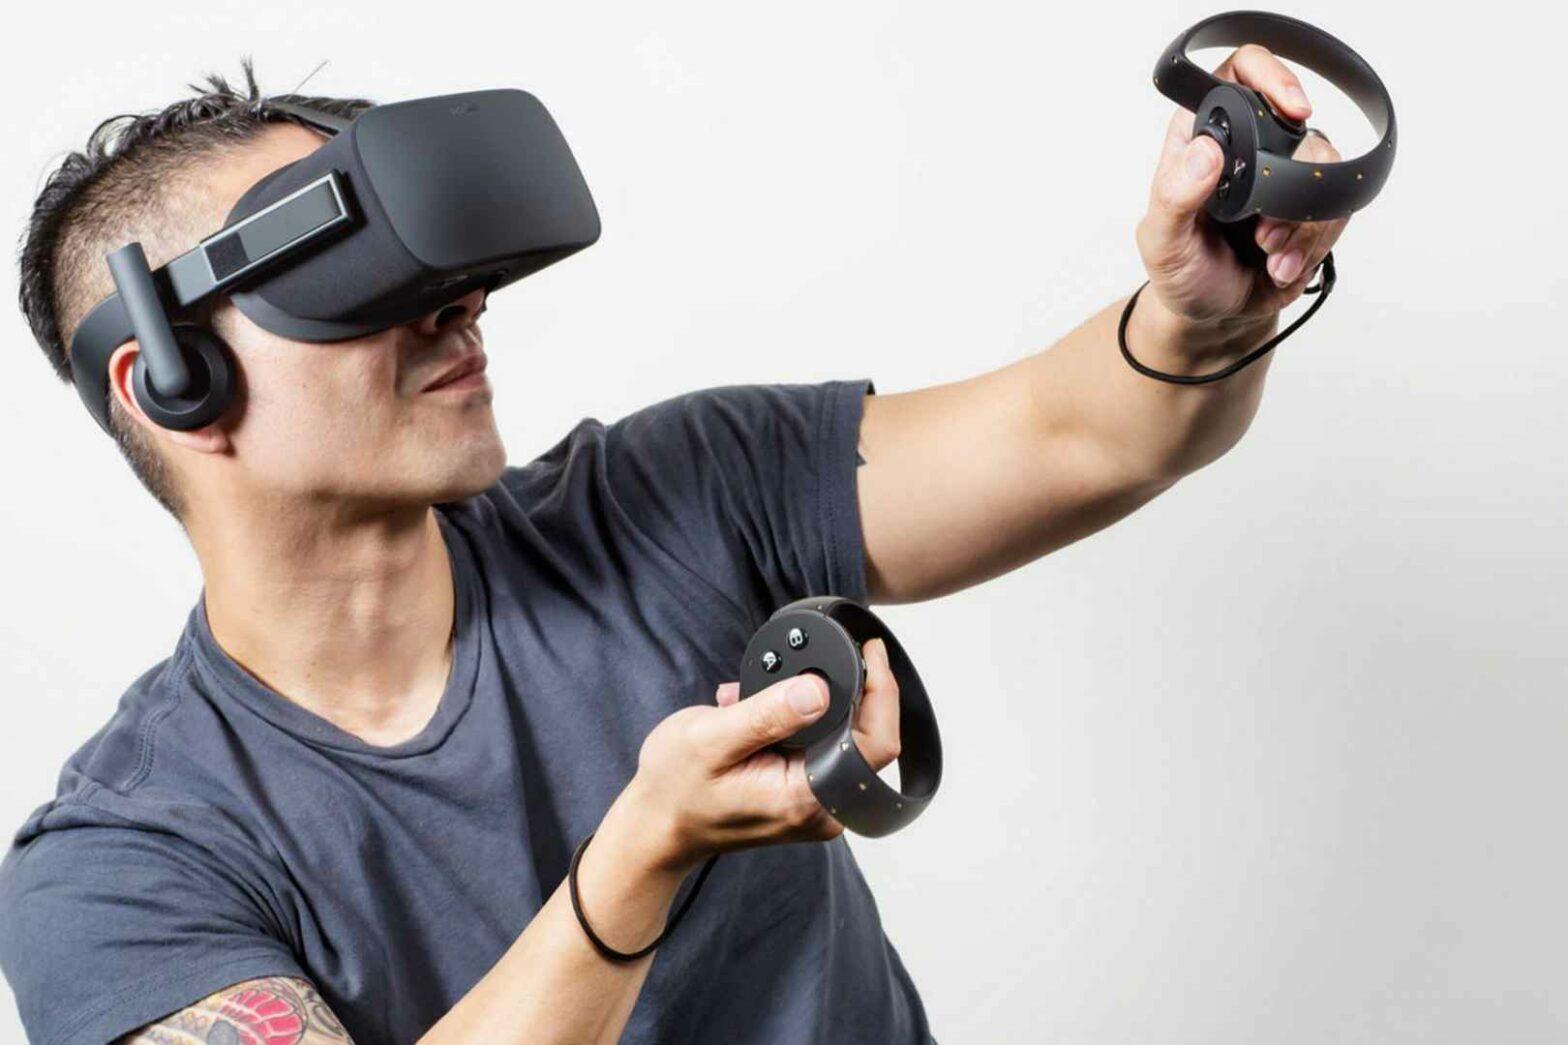 Oculus Rift: Lieferzeit verschoben, Preise explodiert